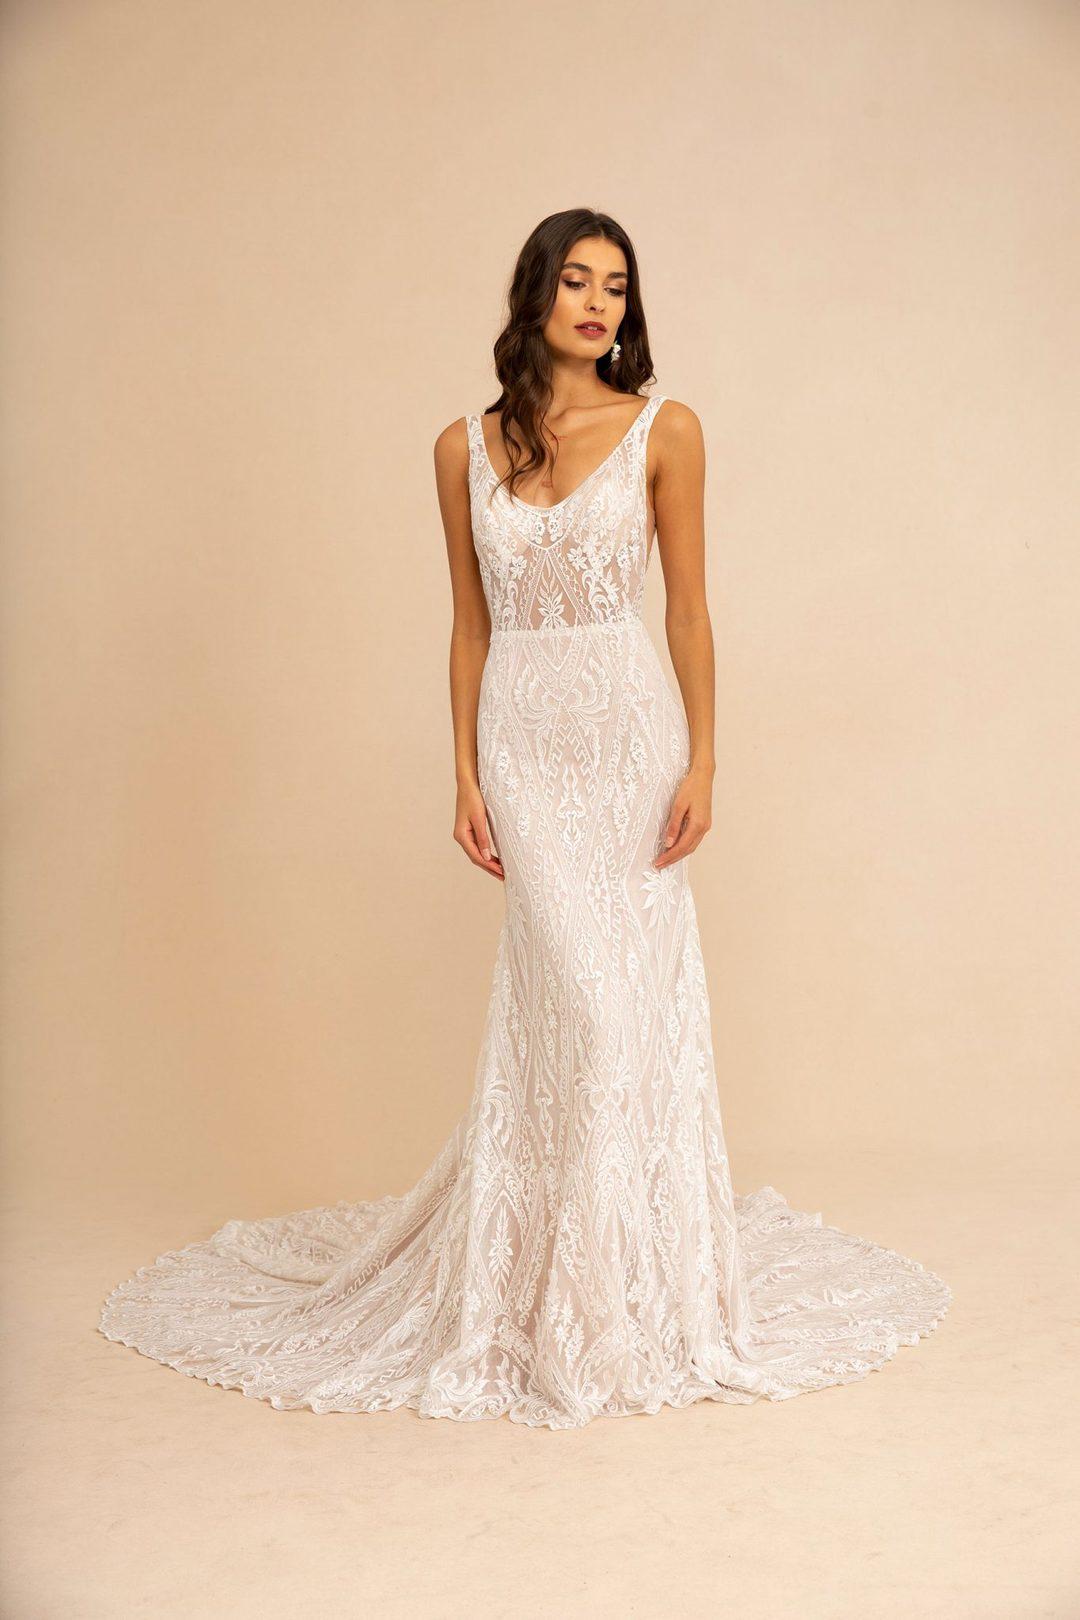 Dress main 2x 1548938577